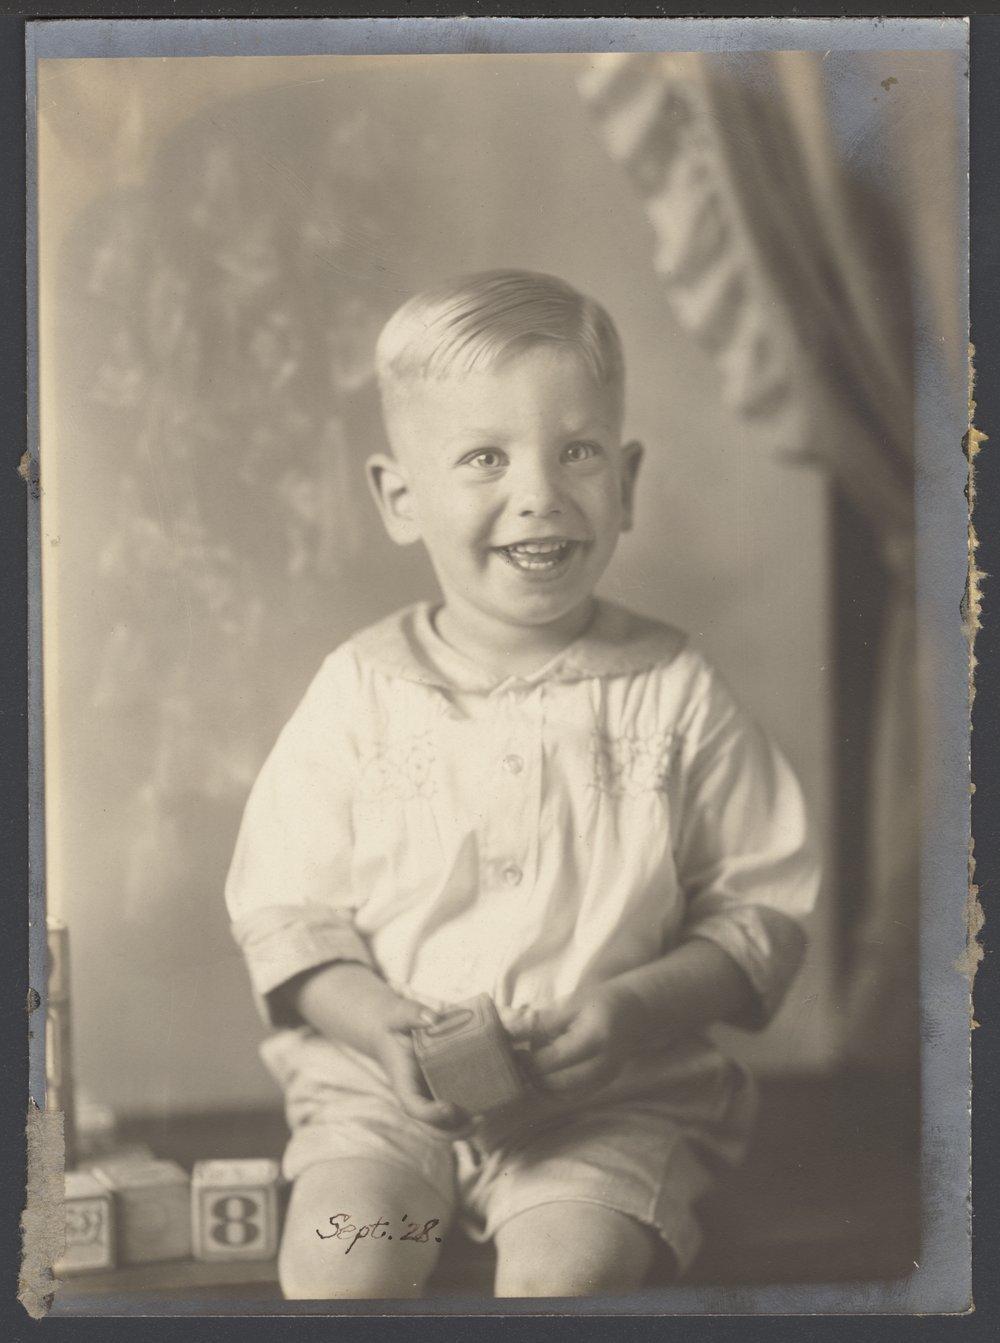 Roy Menninger, M.D. as a child